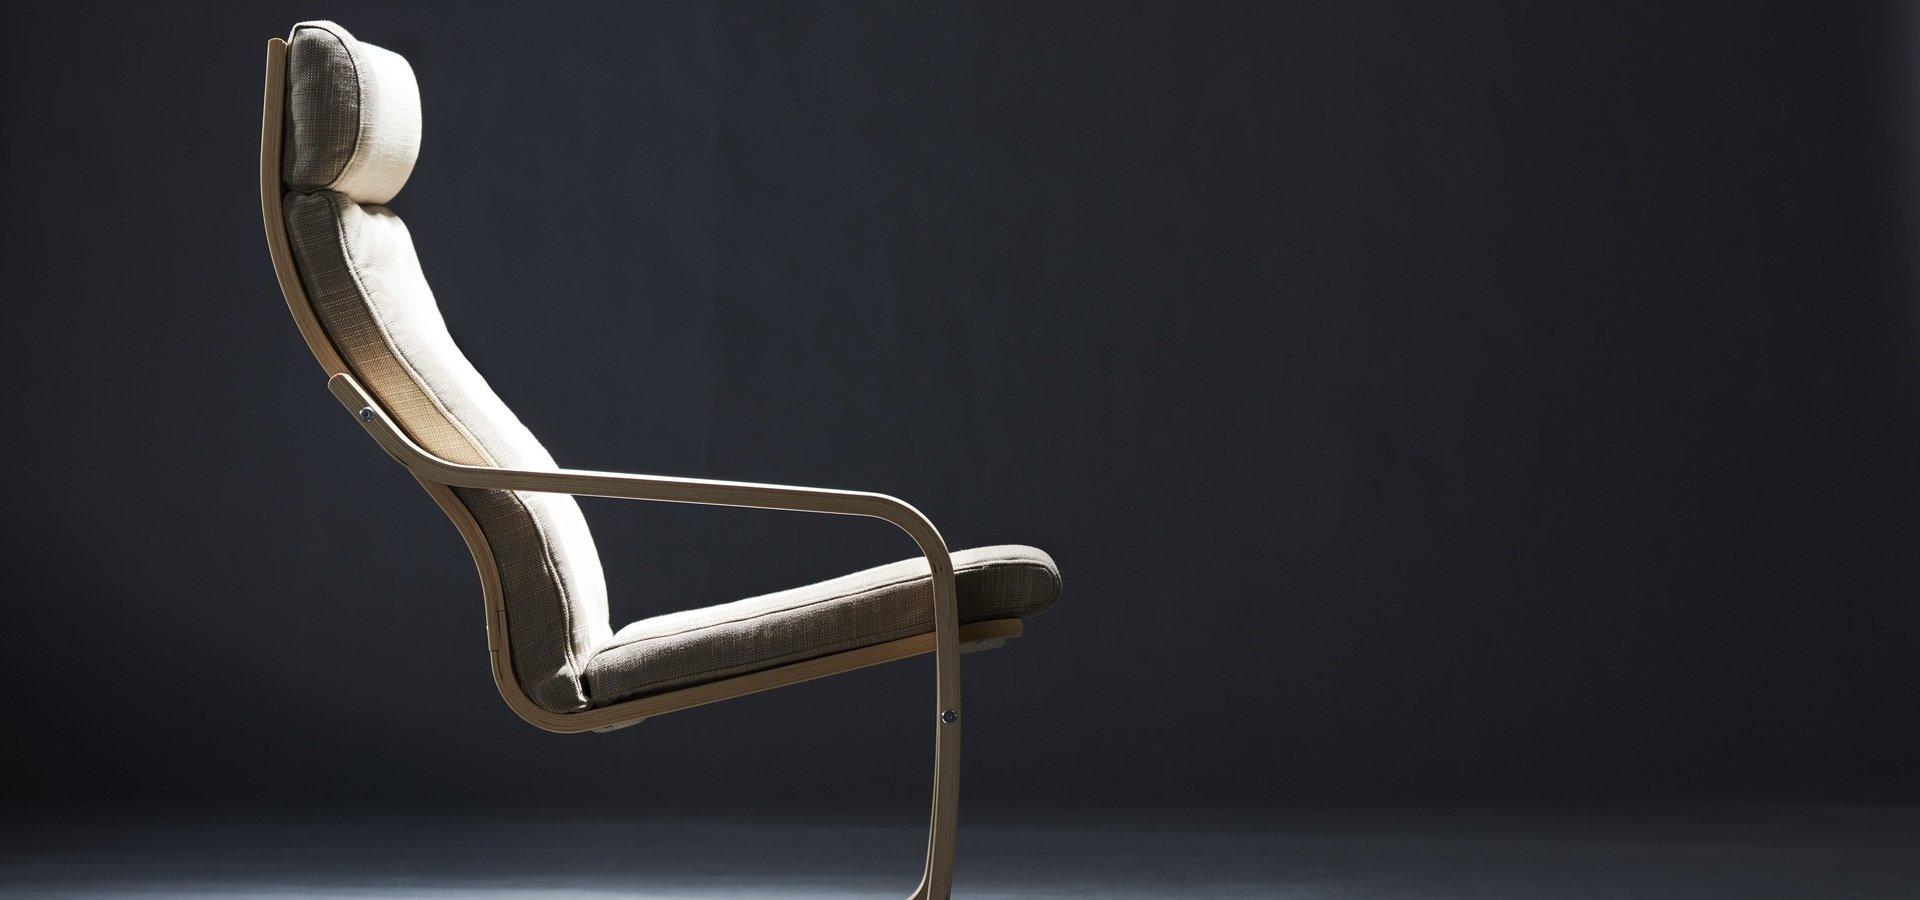 40 lat komfortu i stylu. Okrągły jubileusz fotela POÄNG